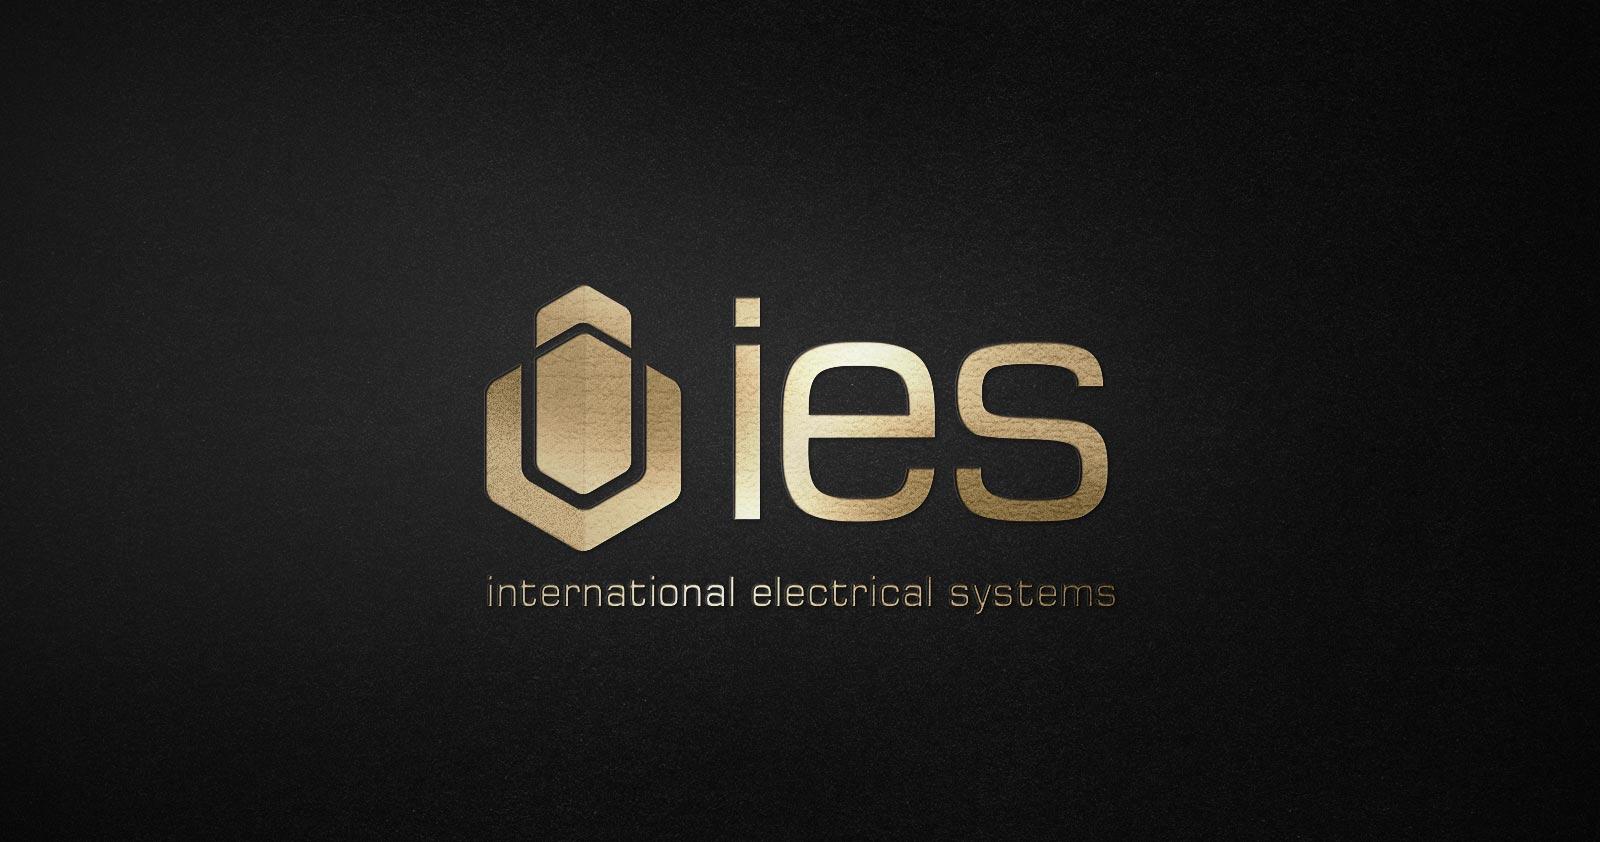 ies logo kurumsal kimlik tasarımı 01